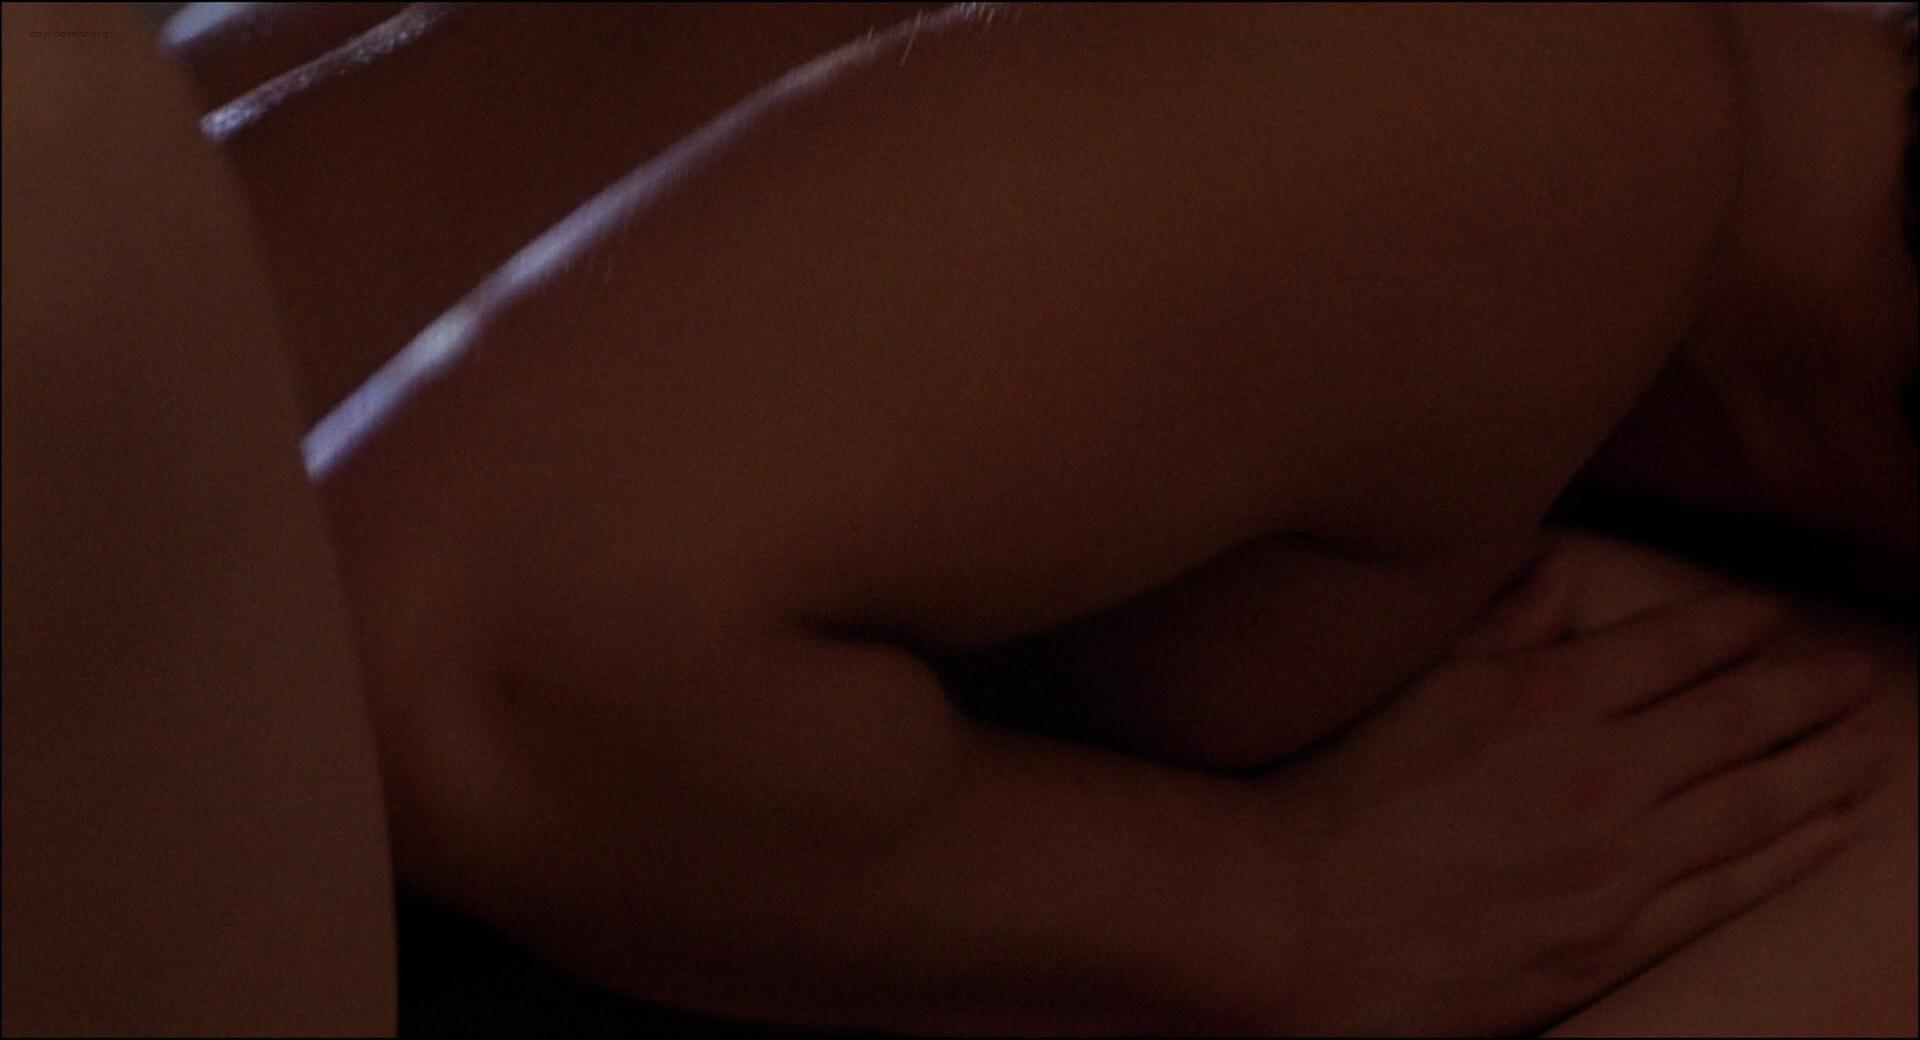 Kim Cattrall nude topless Meg Tilly hot sex Dana Delany hot bikini - Masquerade (1988) HD 1080p BluRay (5)